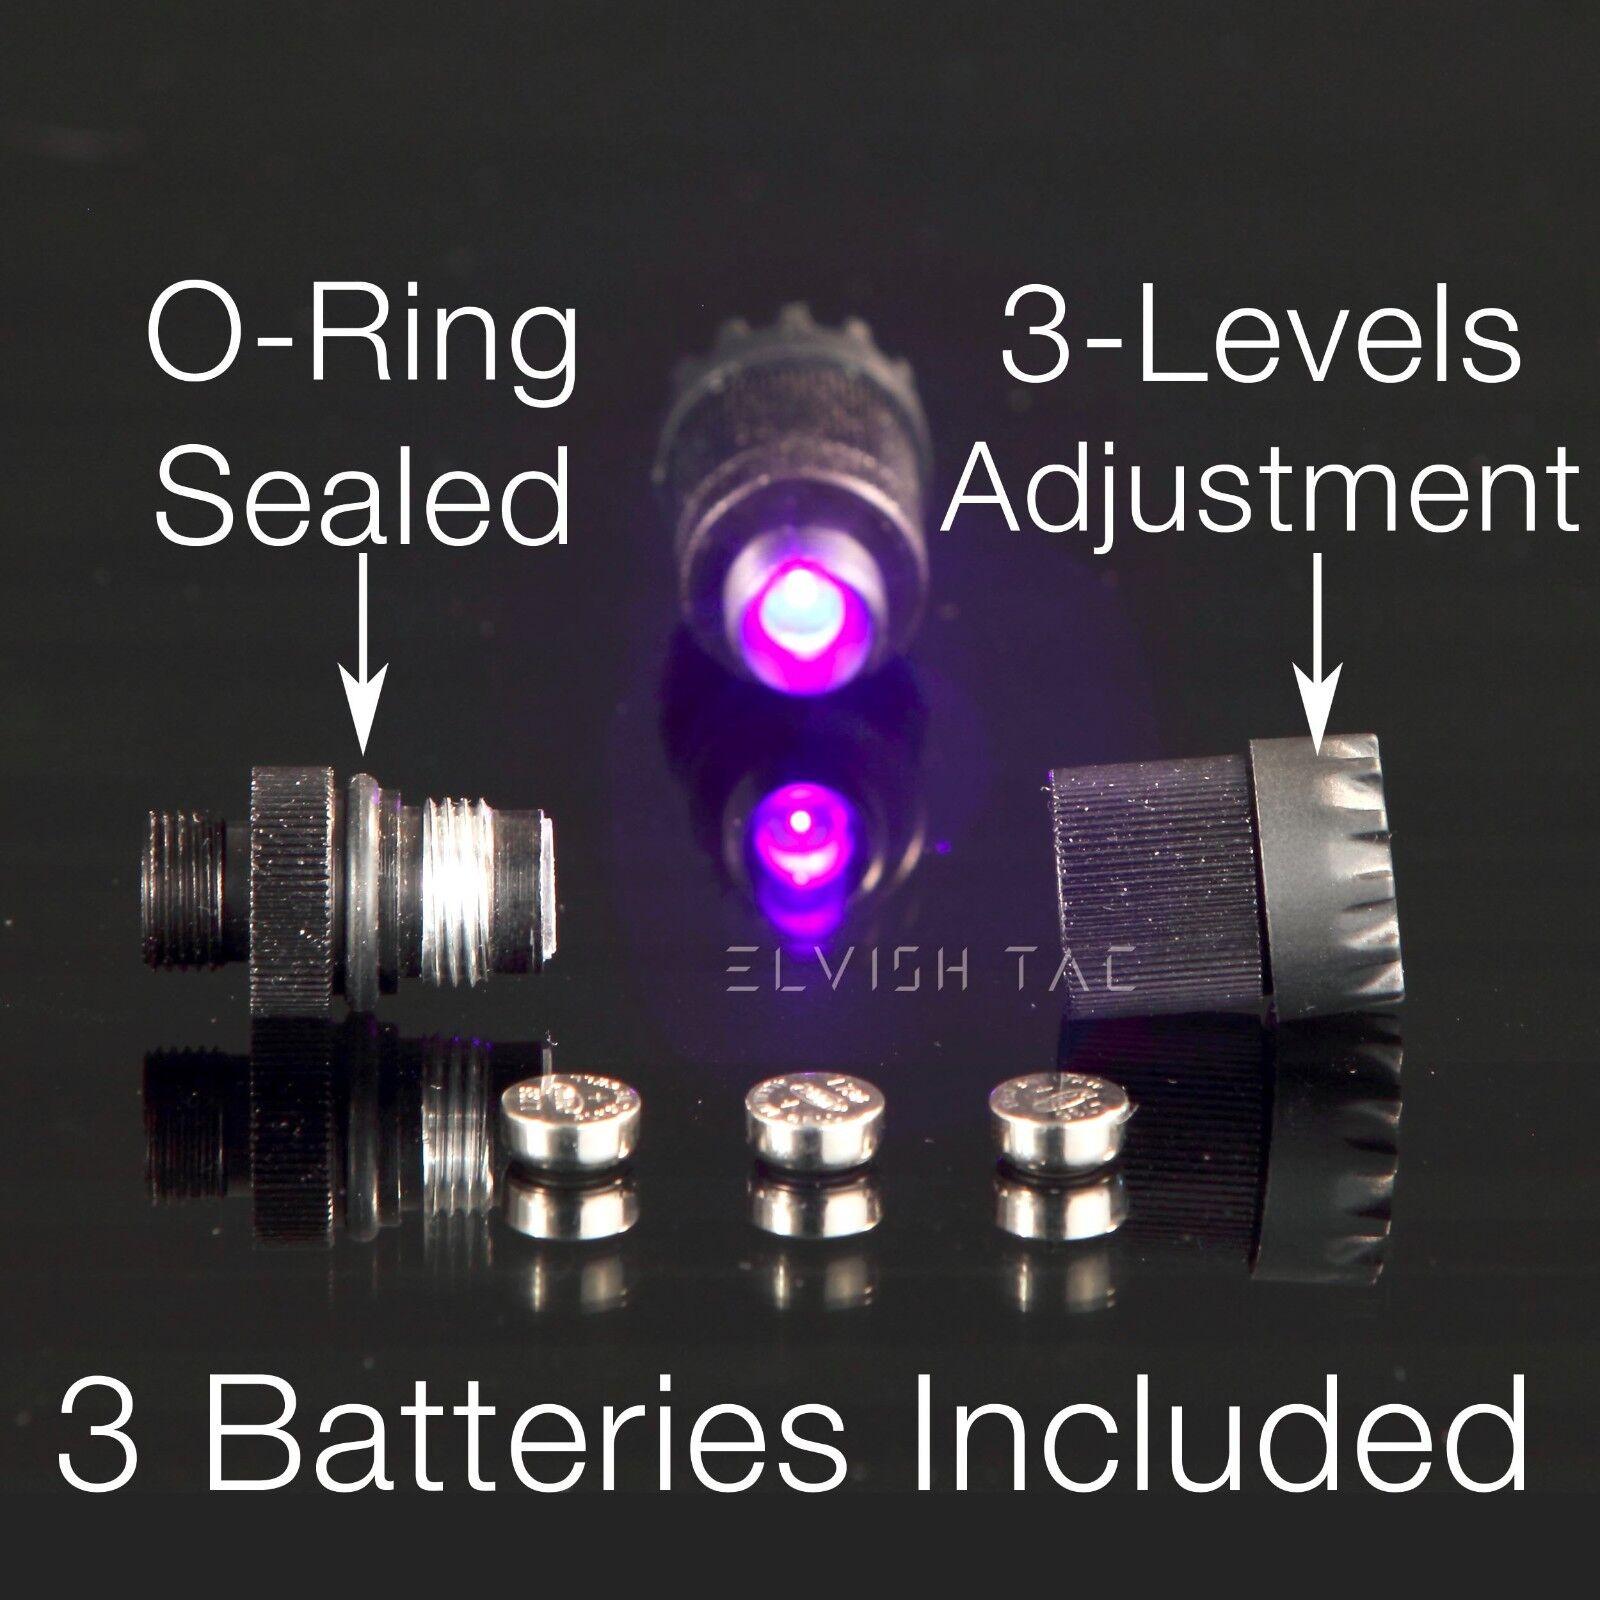 Compound Bow Sight Light Bowlight LED 3-Levels Rheostat 3//8-32 Thread 12 Battery